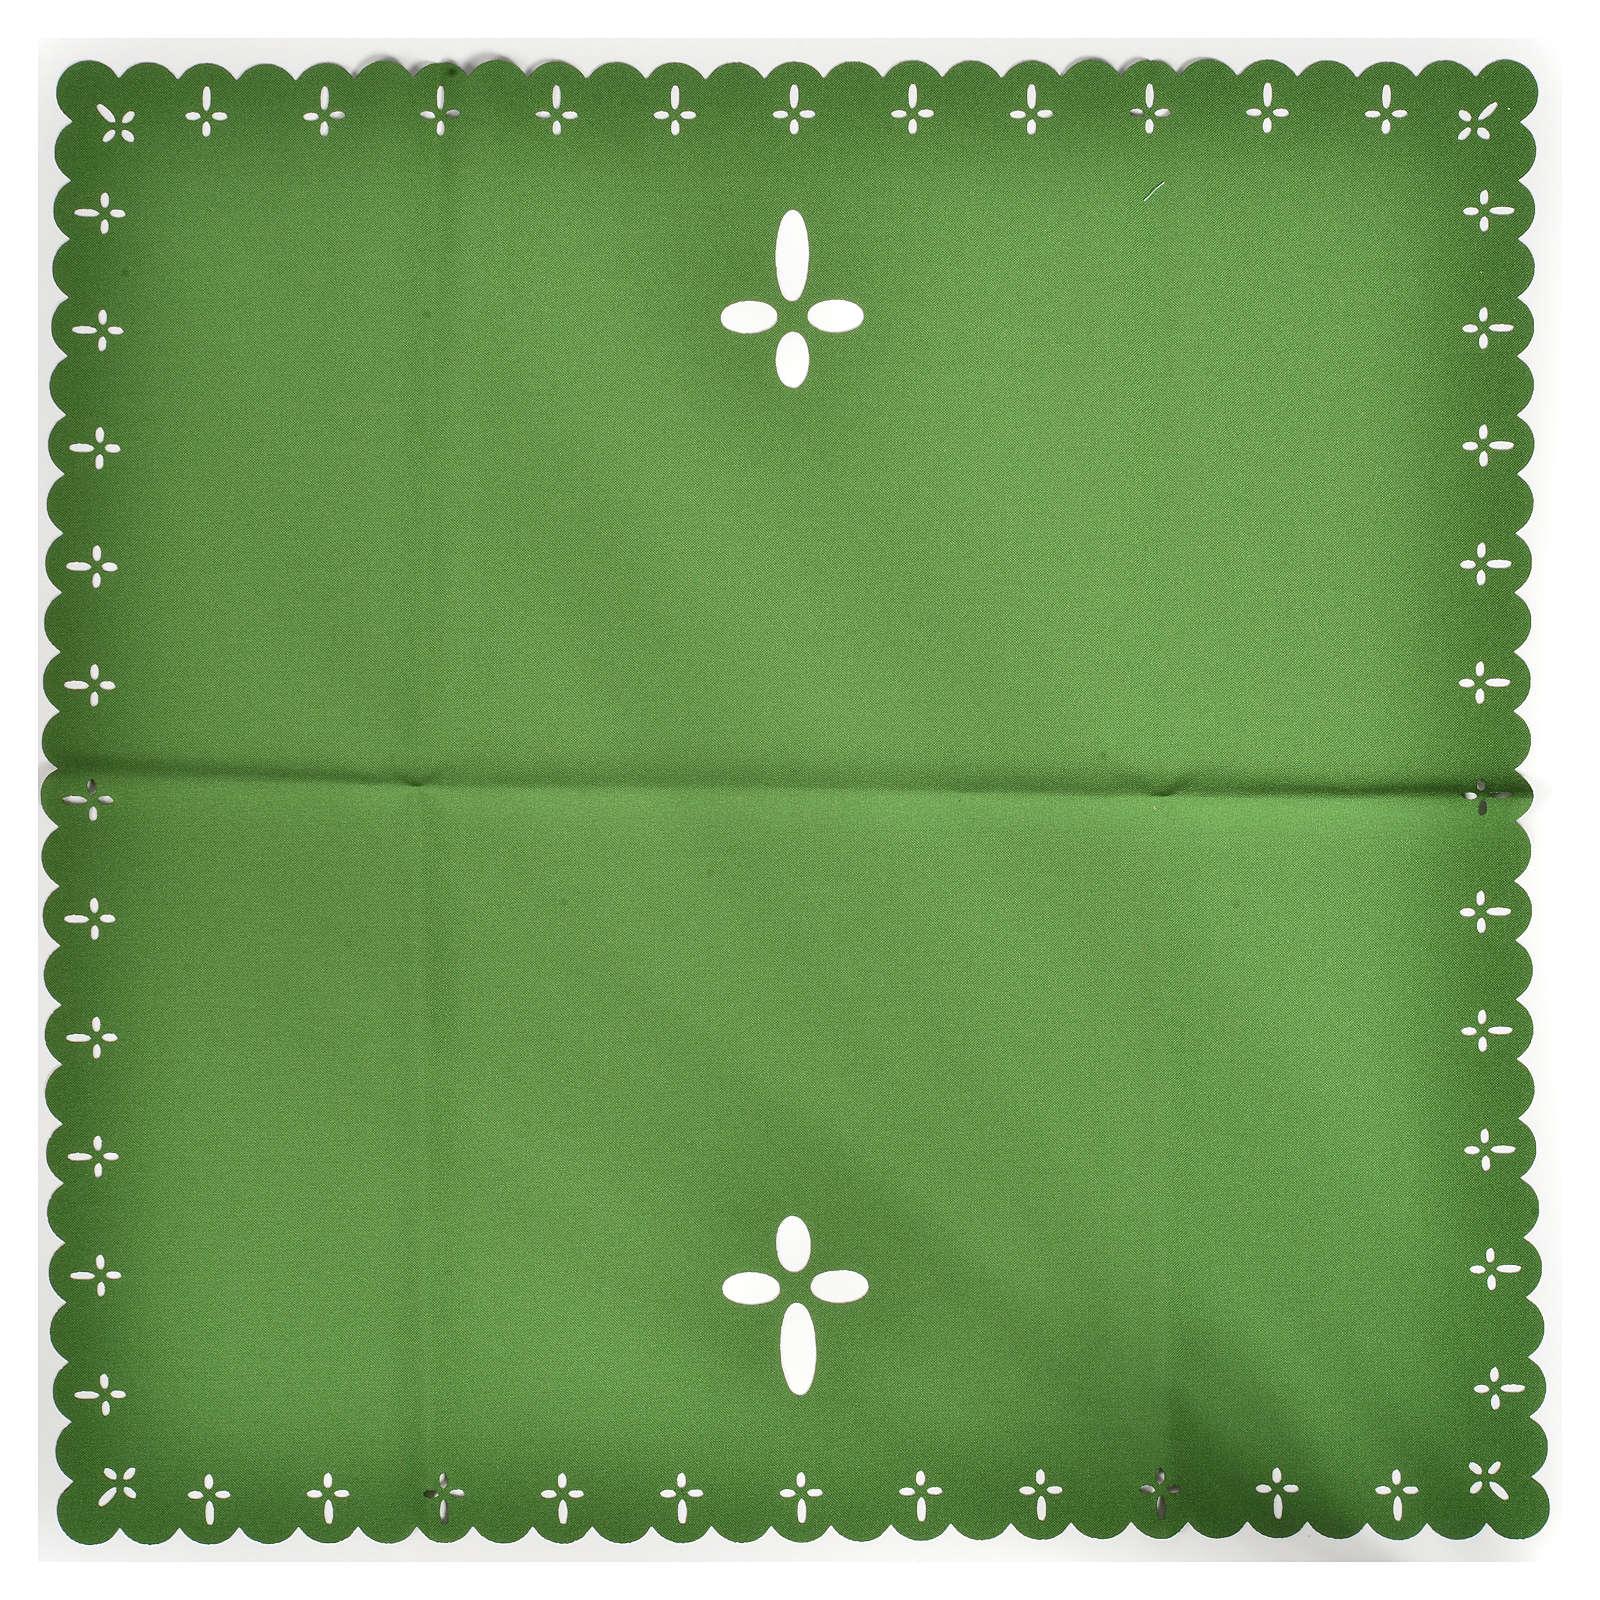 Voile de calice tissu coupé au laser 4